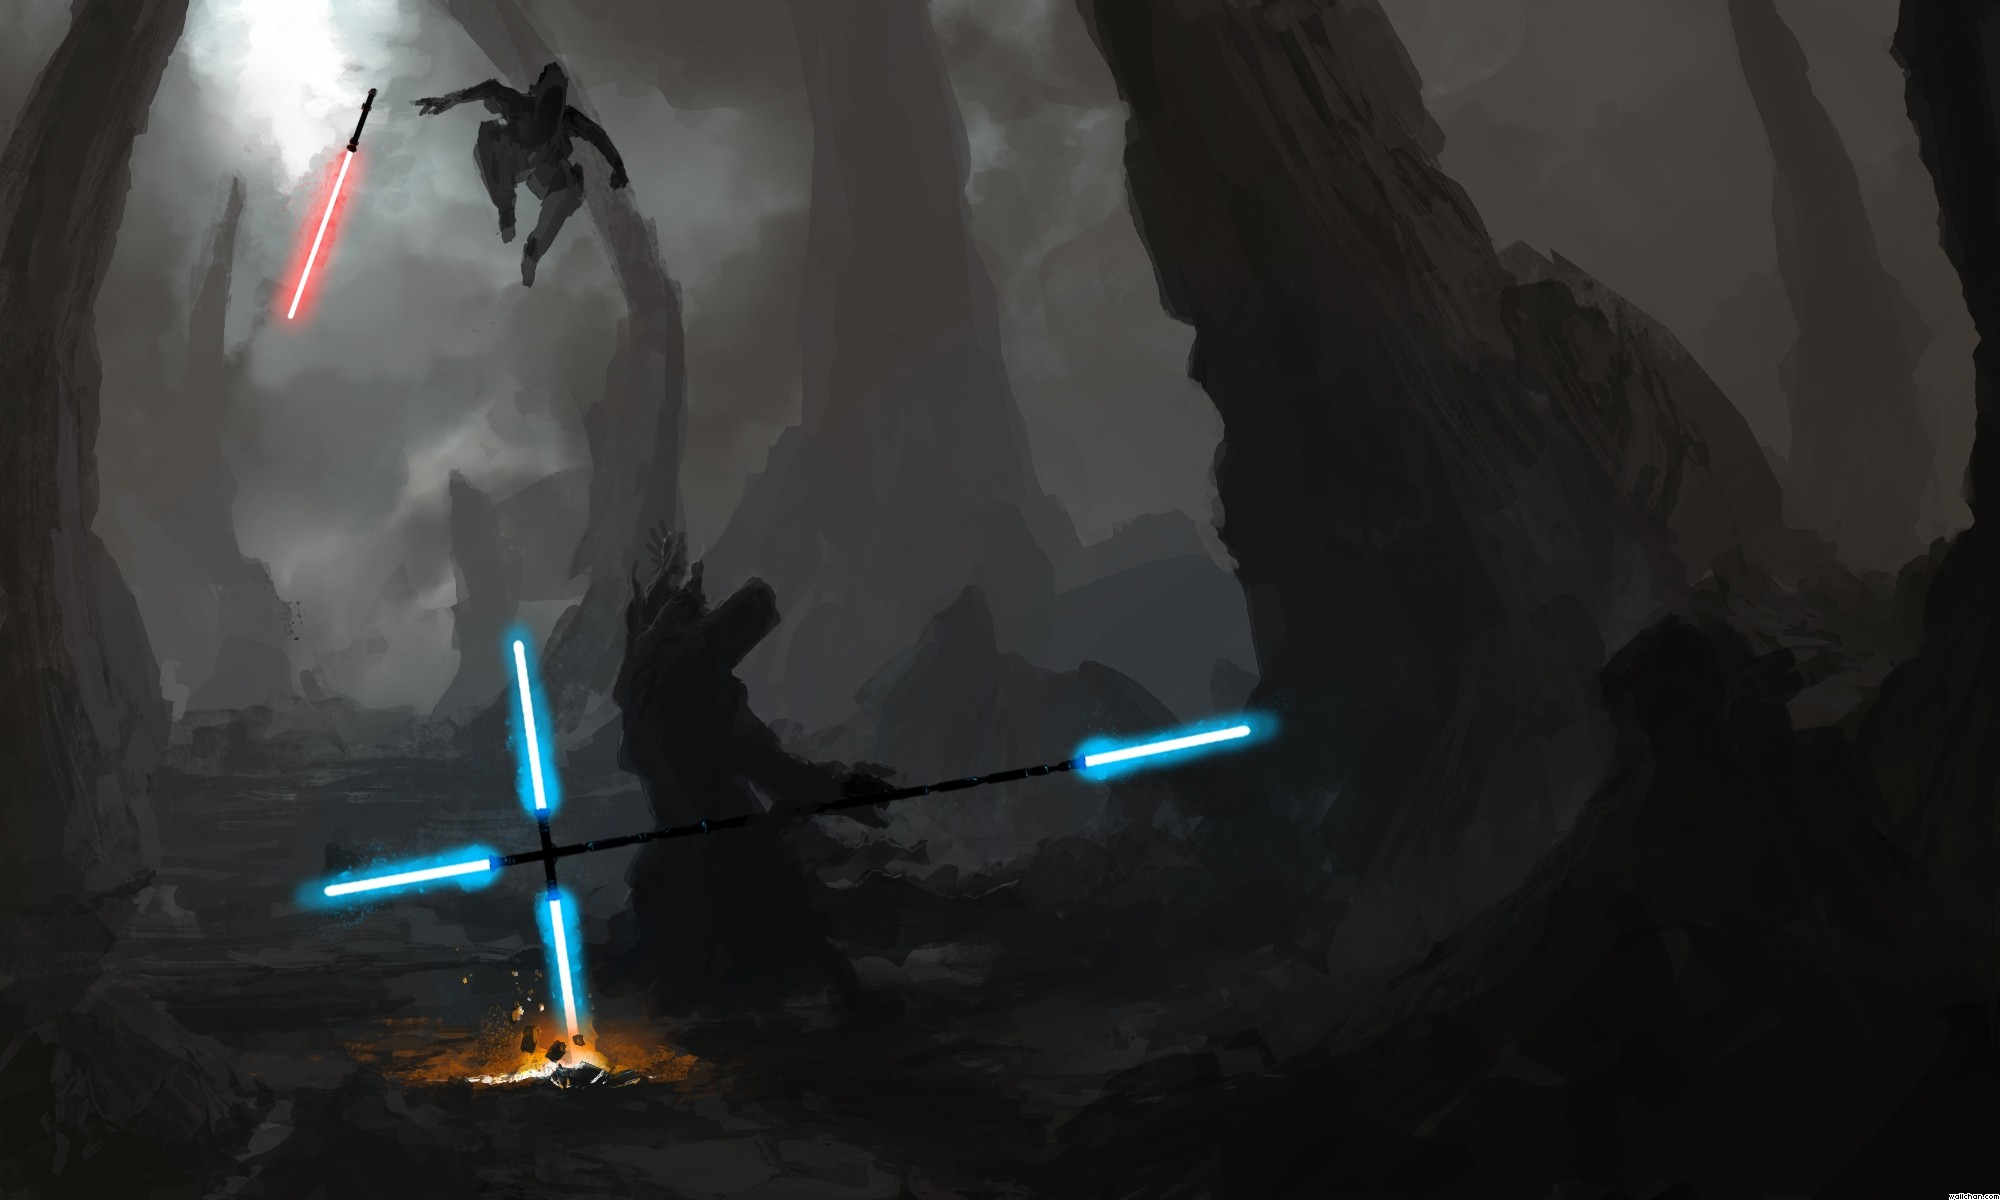 2560x1440 Star Wars Rebel Alliance Wallpaper